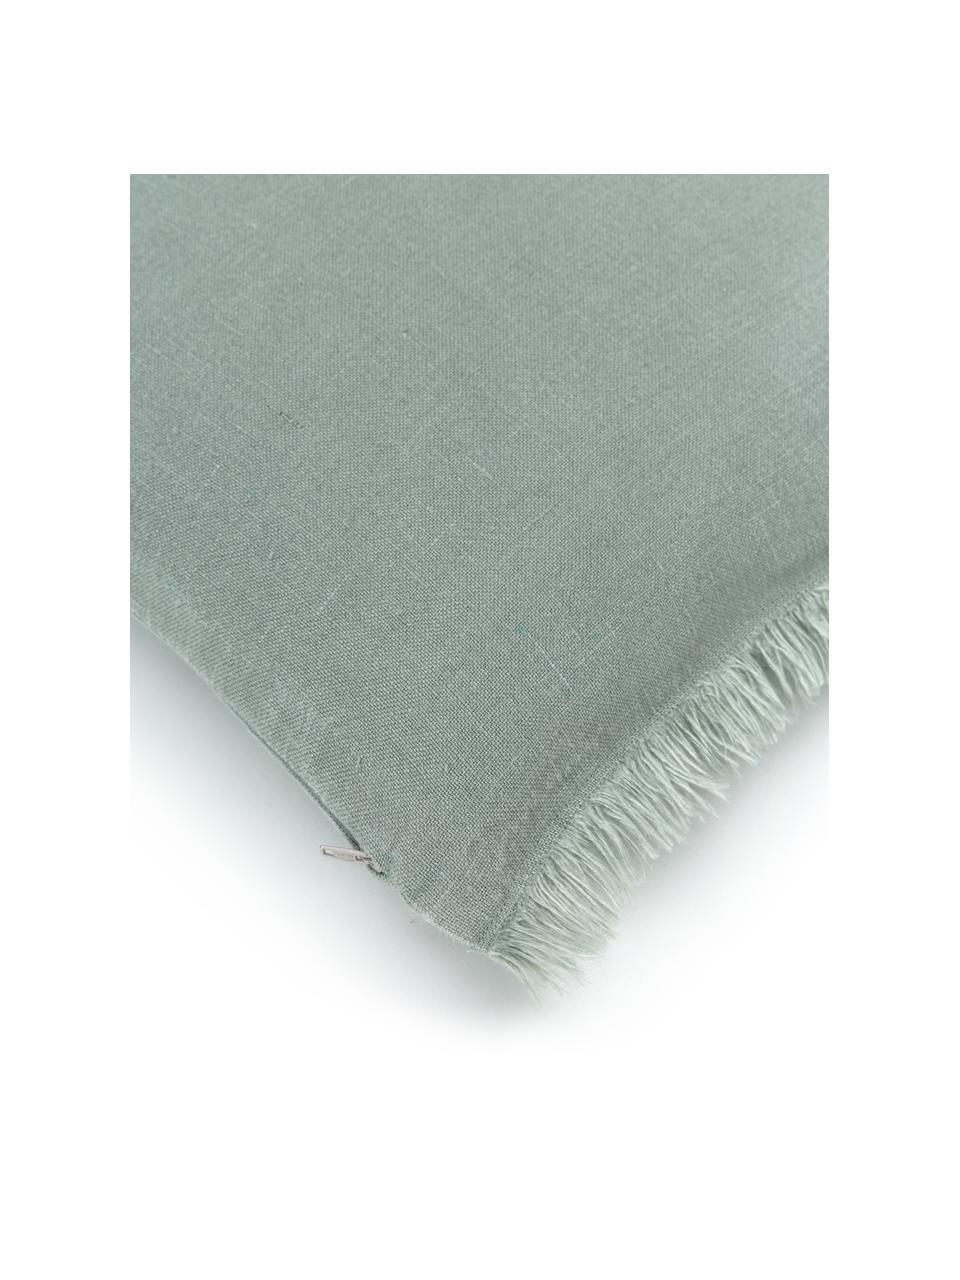 Federa arredo in lino verde salvia con frange Luana, 100% lino, Verde, Larg. 40 x Lung. 40 cm